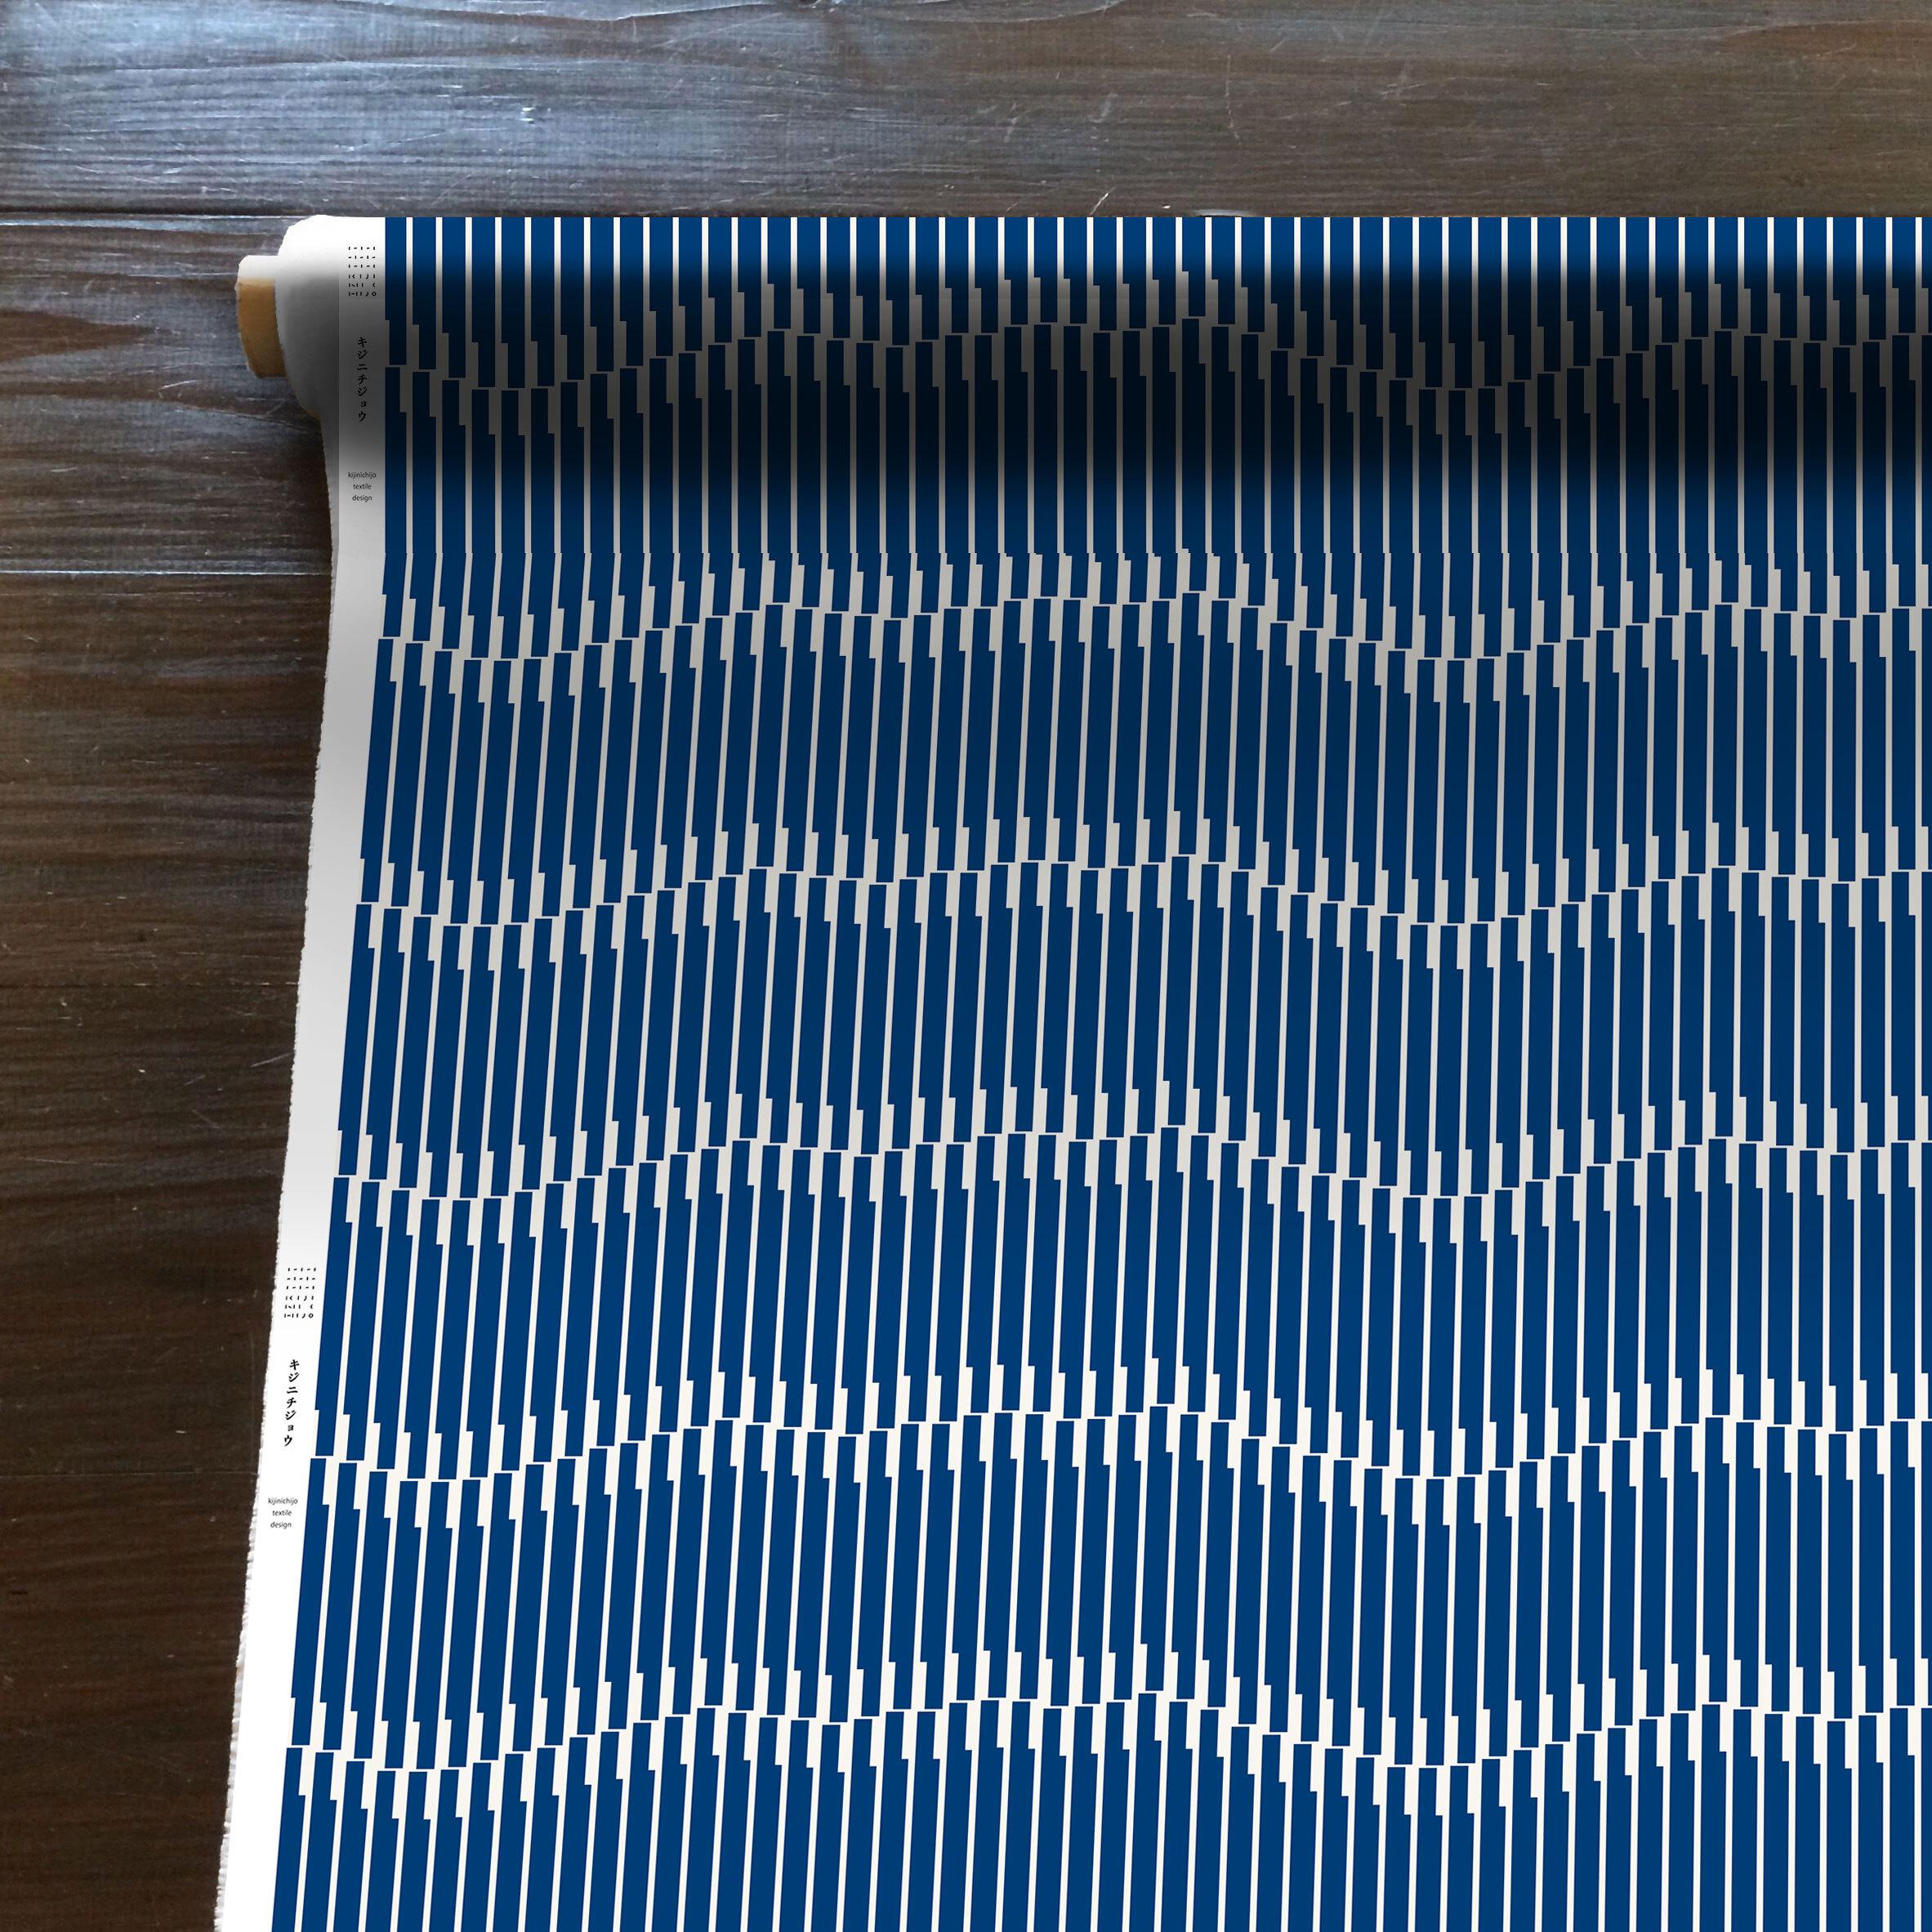 Sand crest(青)[50cm×110cm]cotton